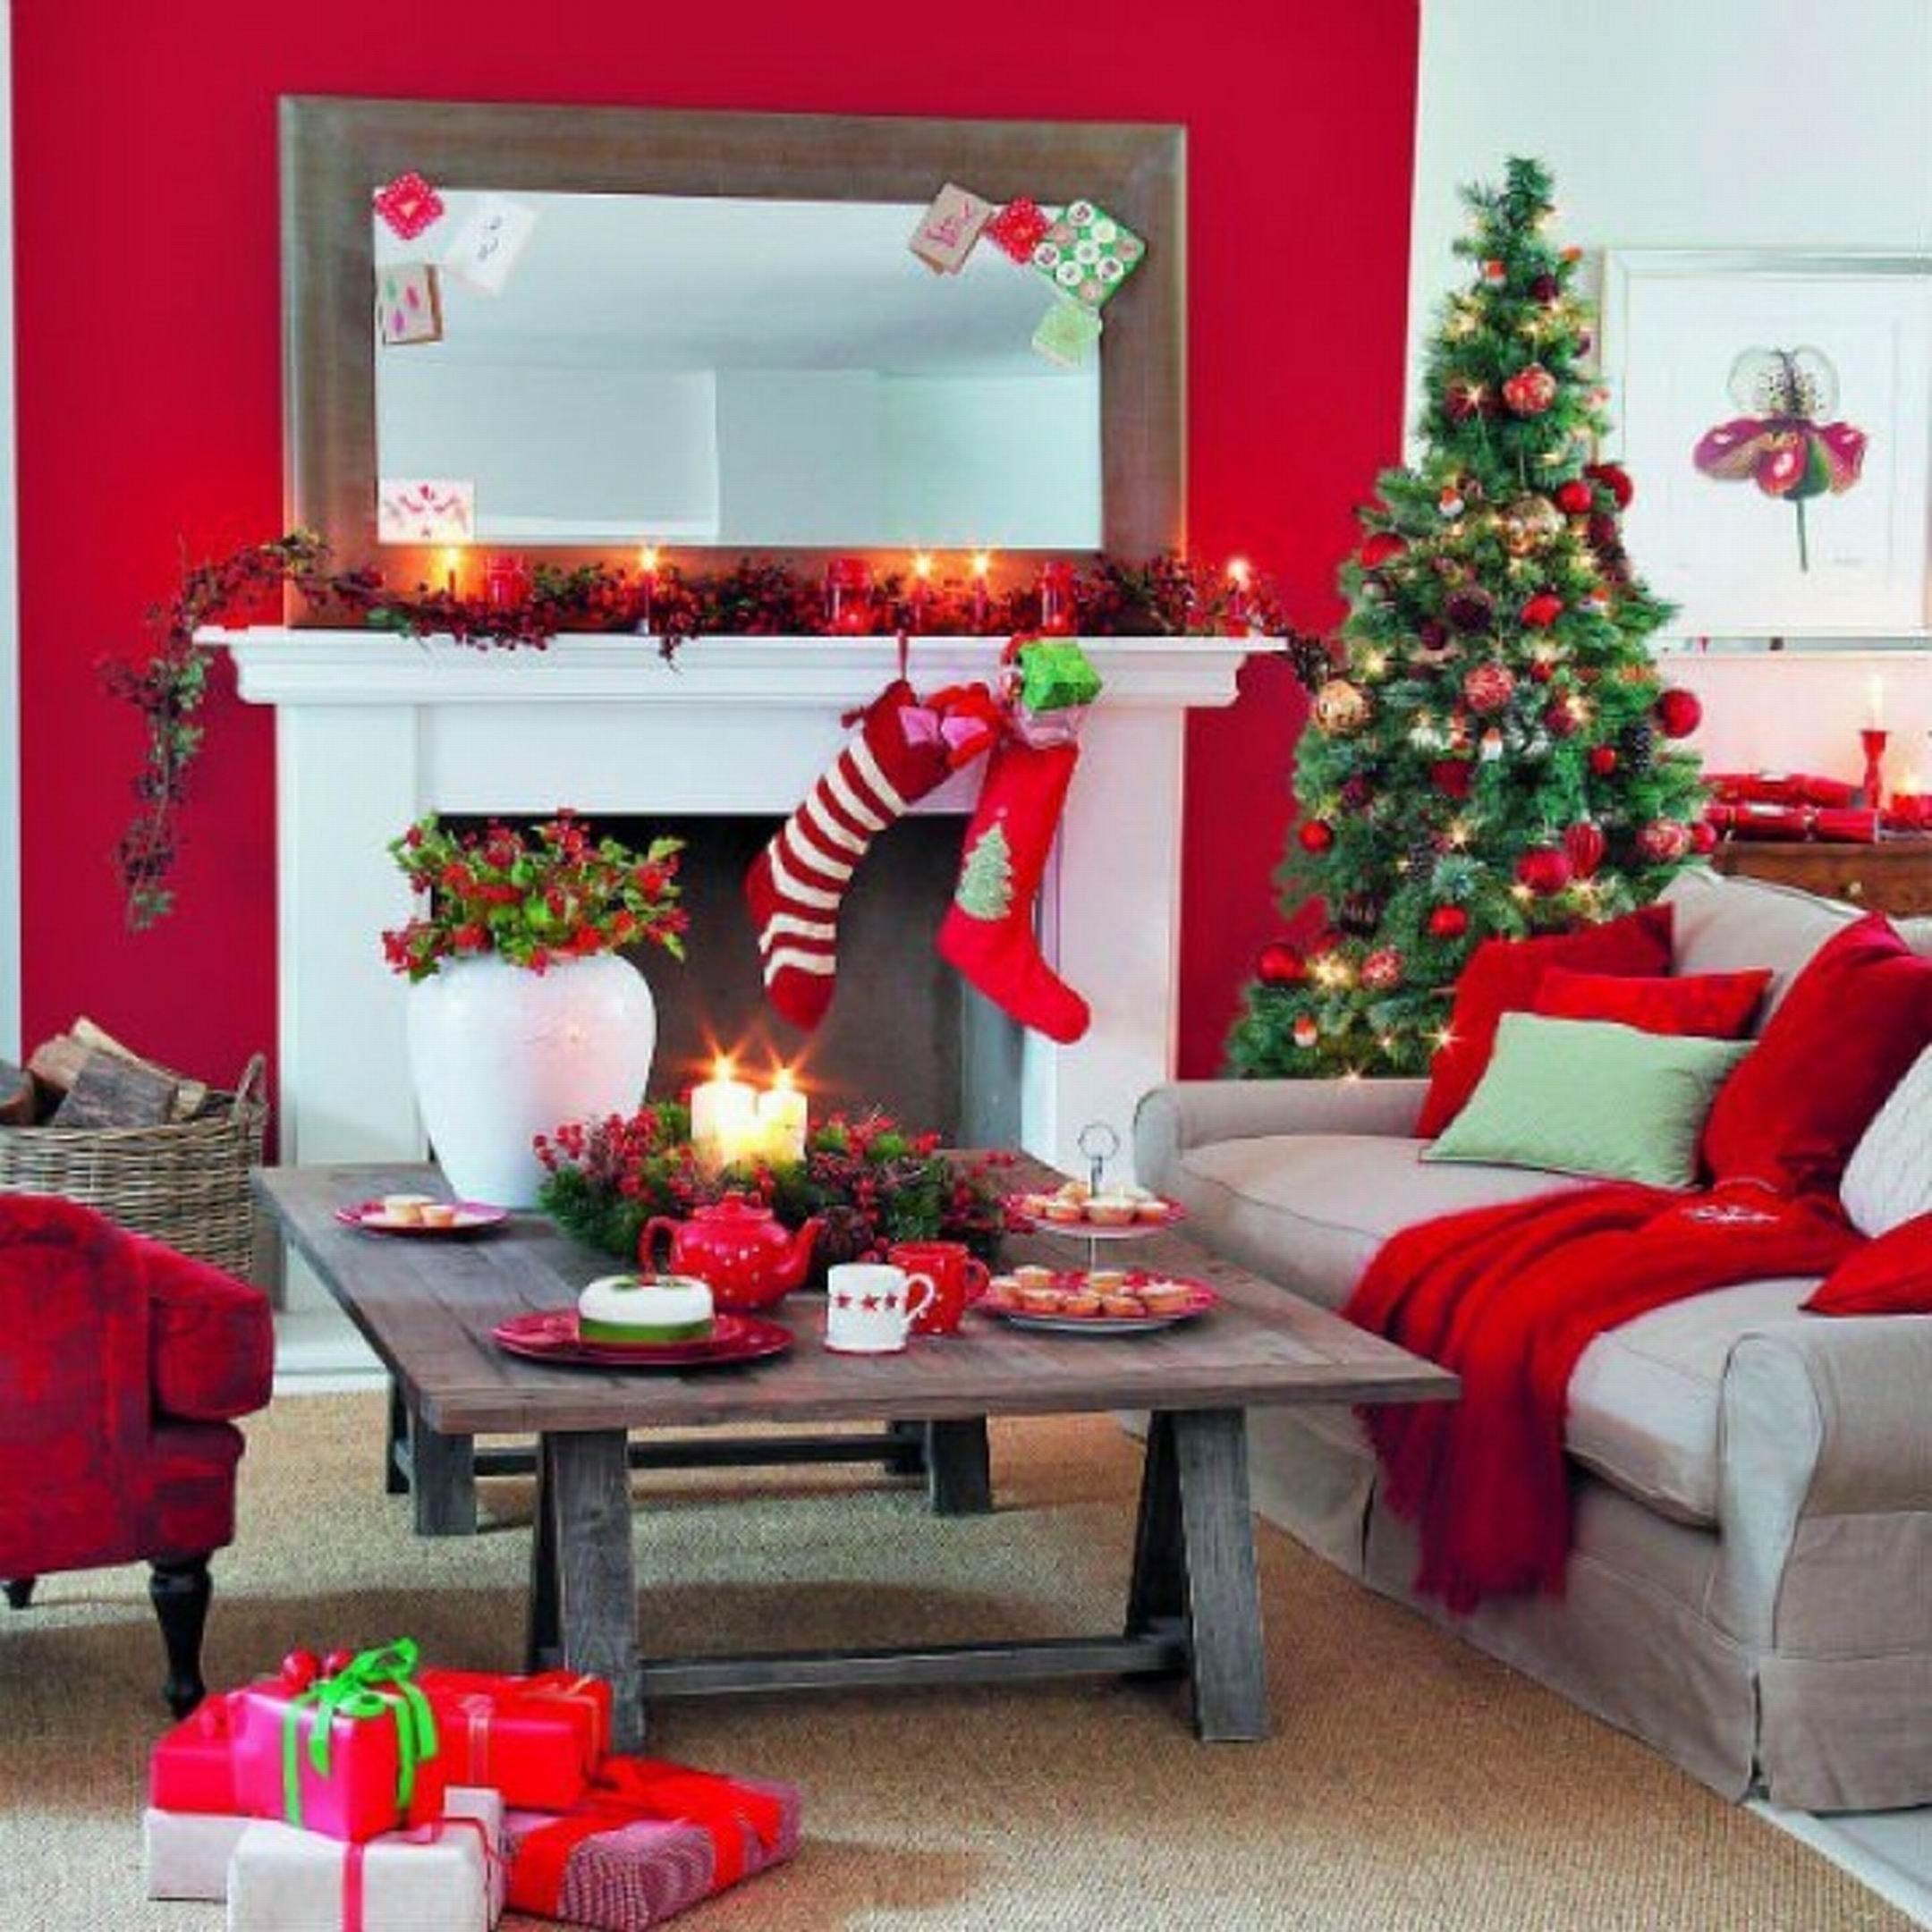 10 Pretty Christmas Decorations Ideas For Living Room how to decorate your room for christmas decoration ideas decor small 2021